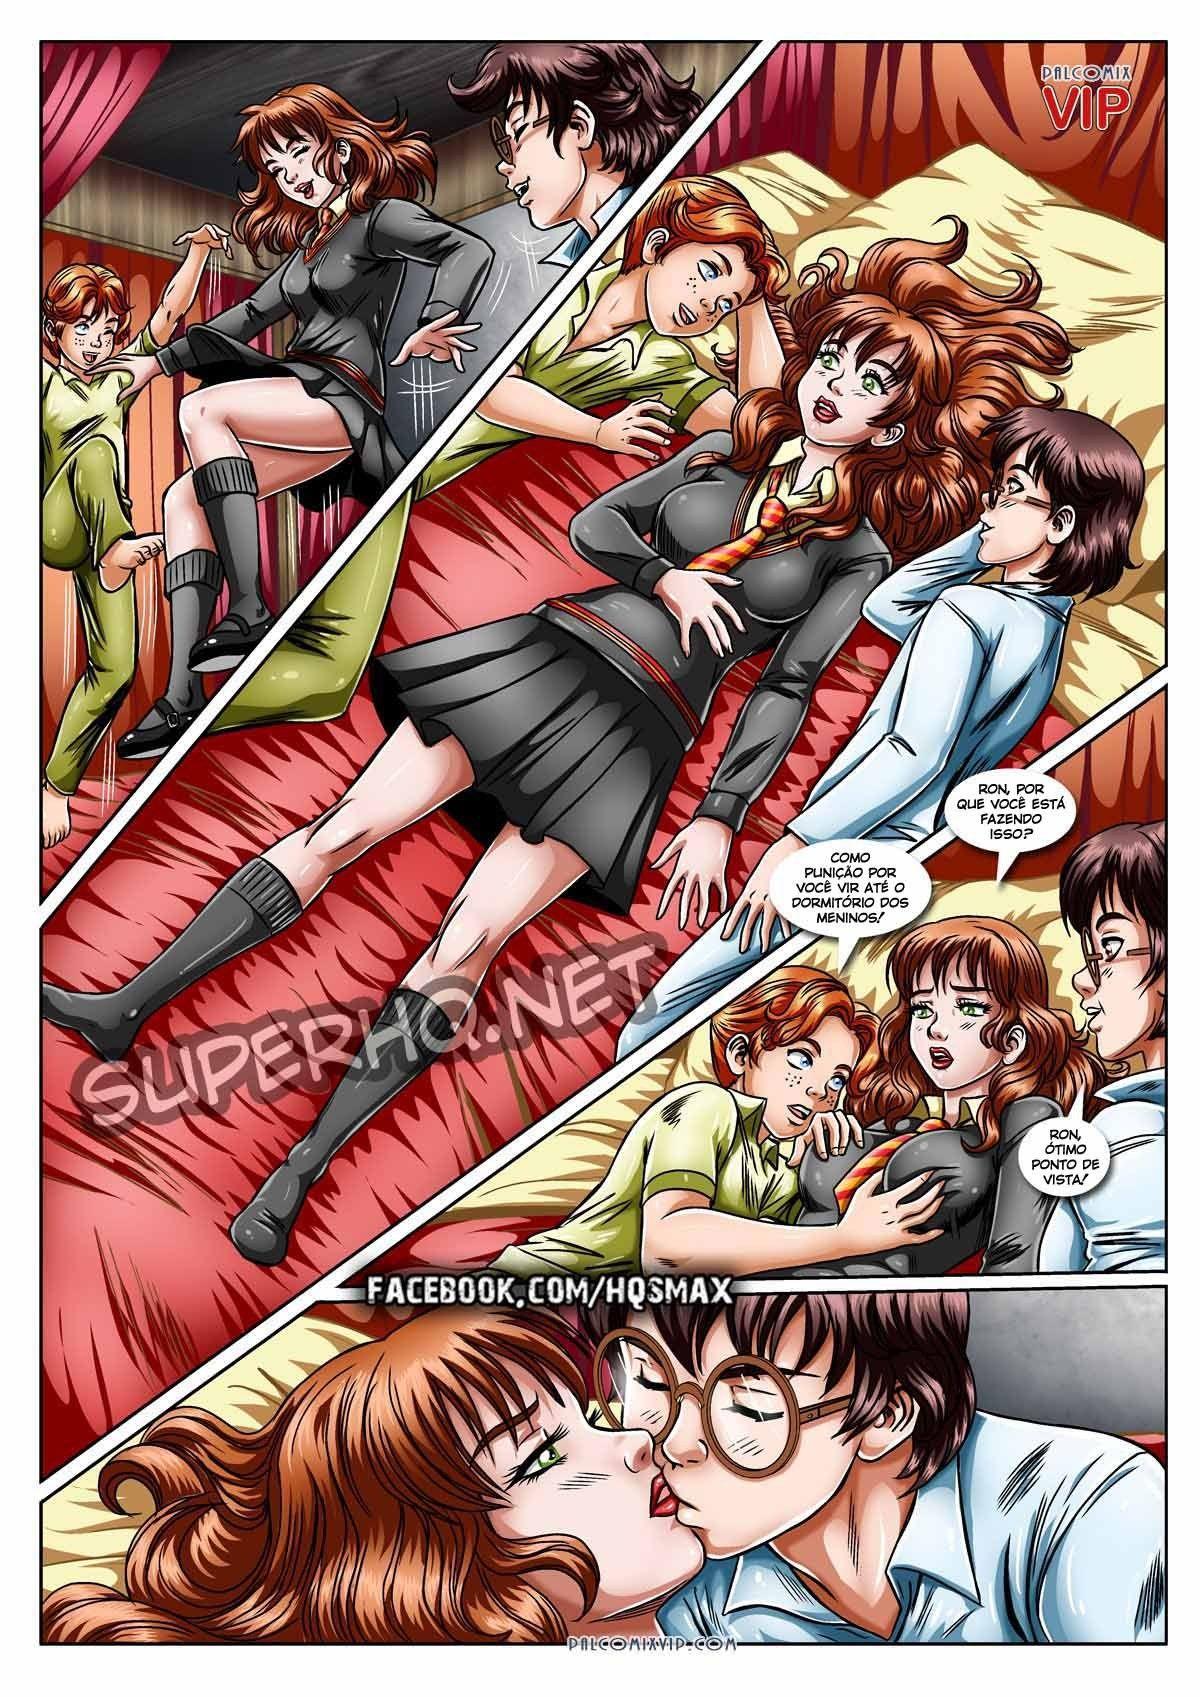 O-presente-da-Hermione-Harry-Potter-HQ-Erótico-3